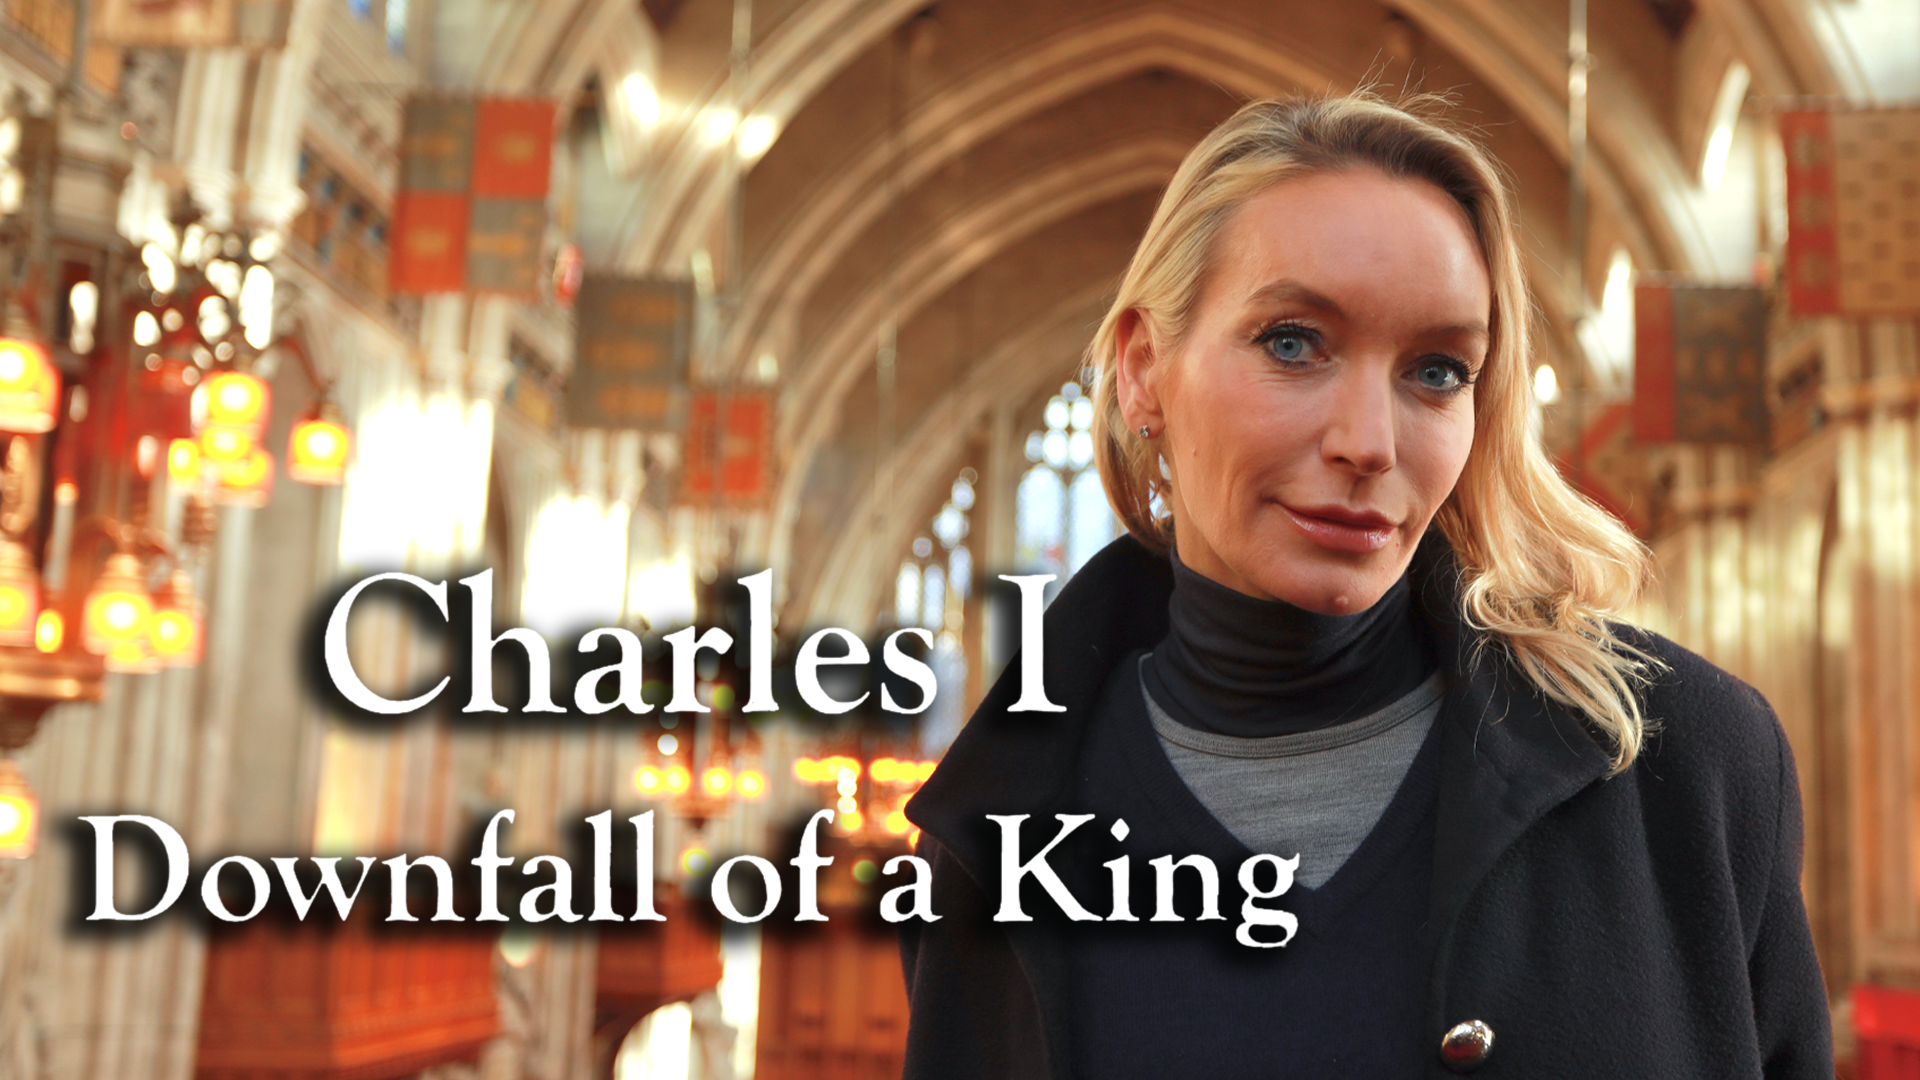 Charles I Downfall of a King